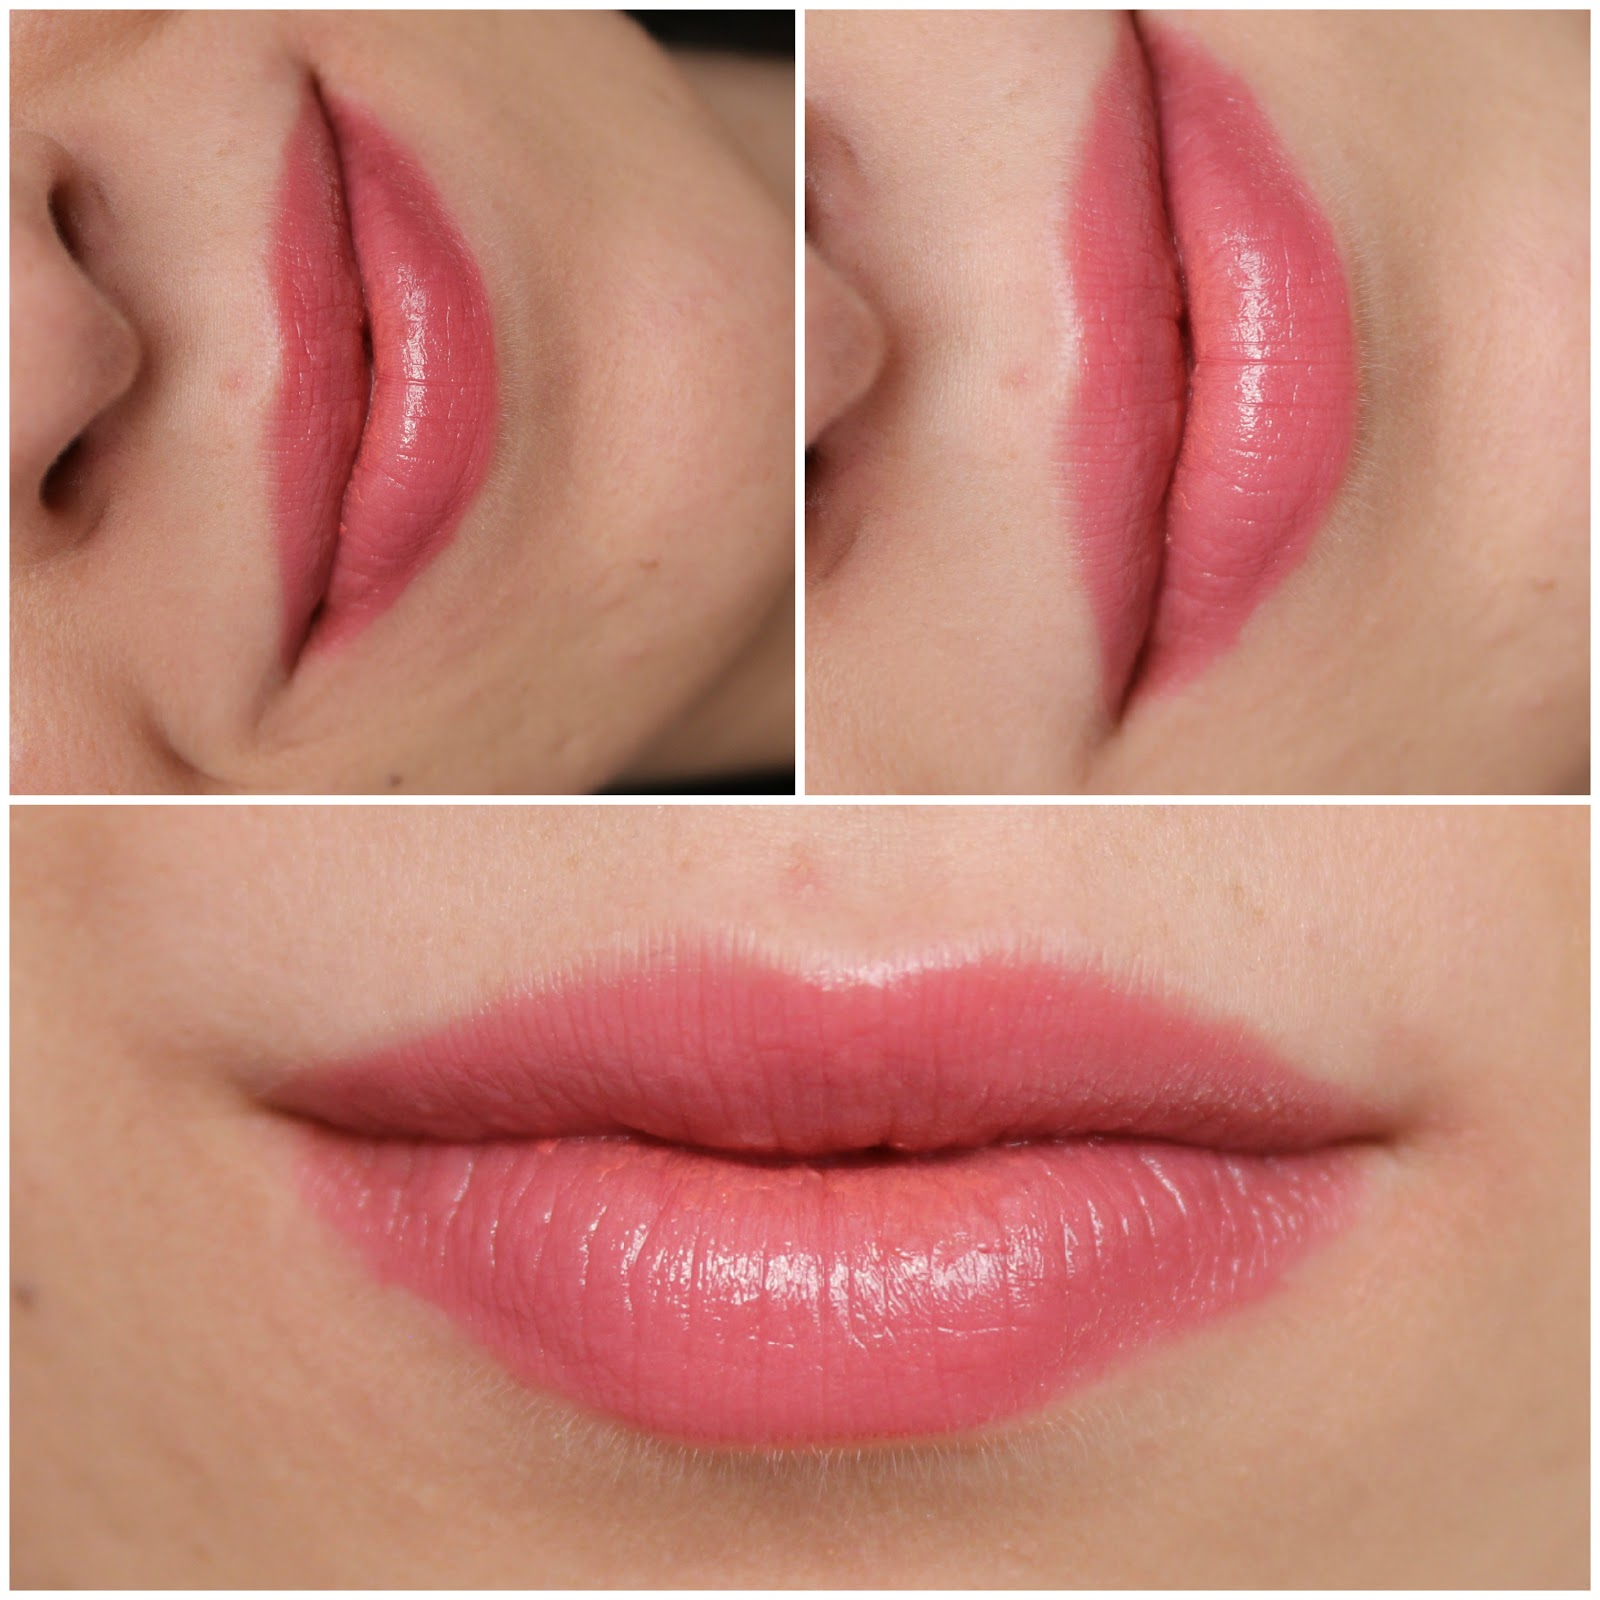 Amazon.com : Revlon Super Lustrous Lipgloss, SPF 15, Nude